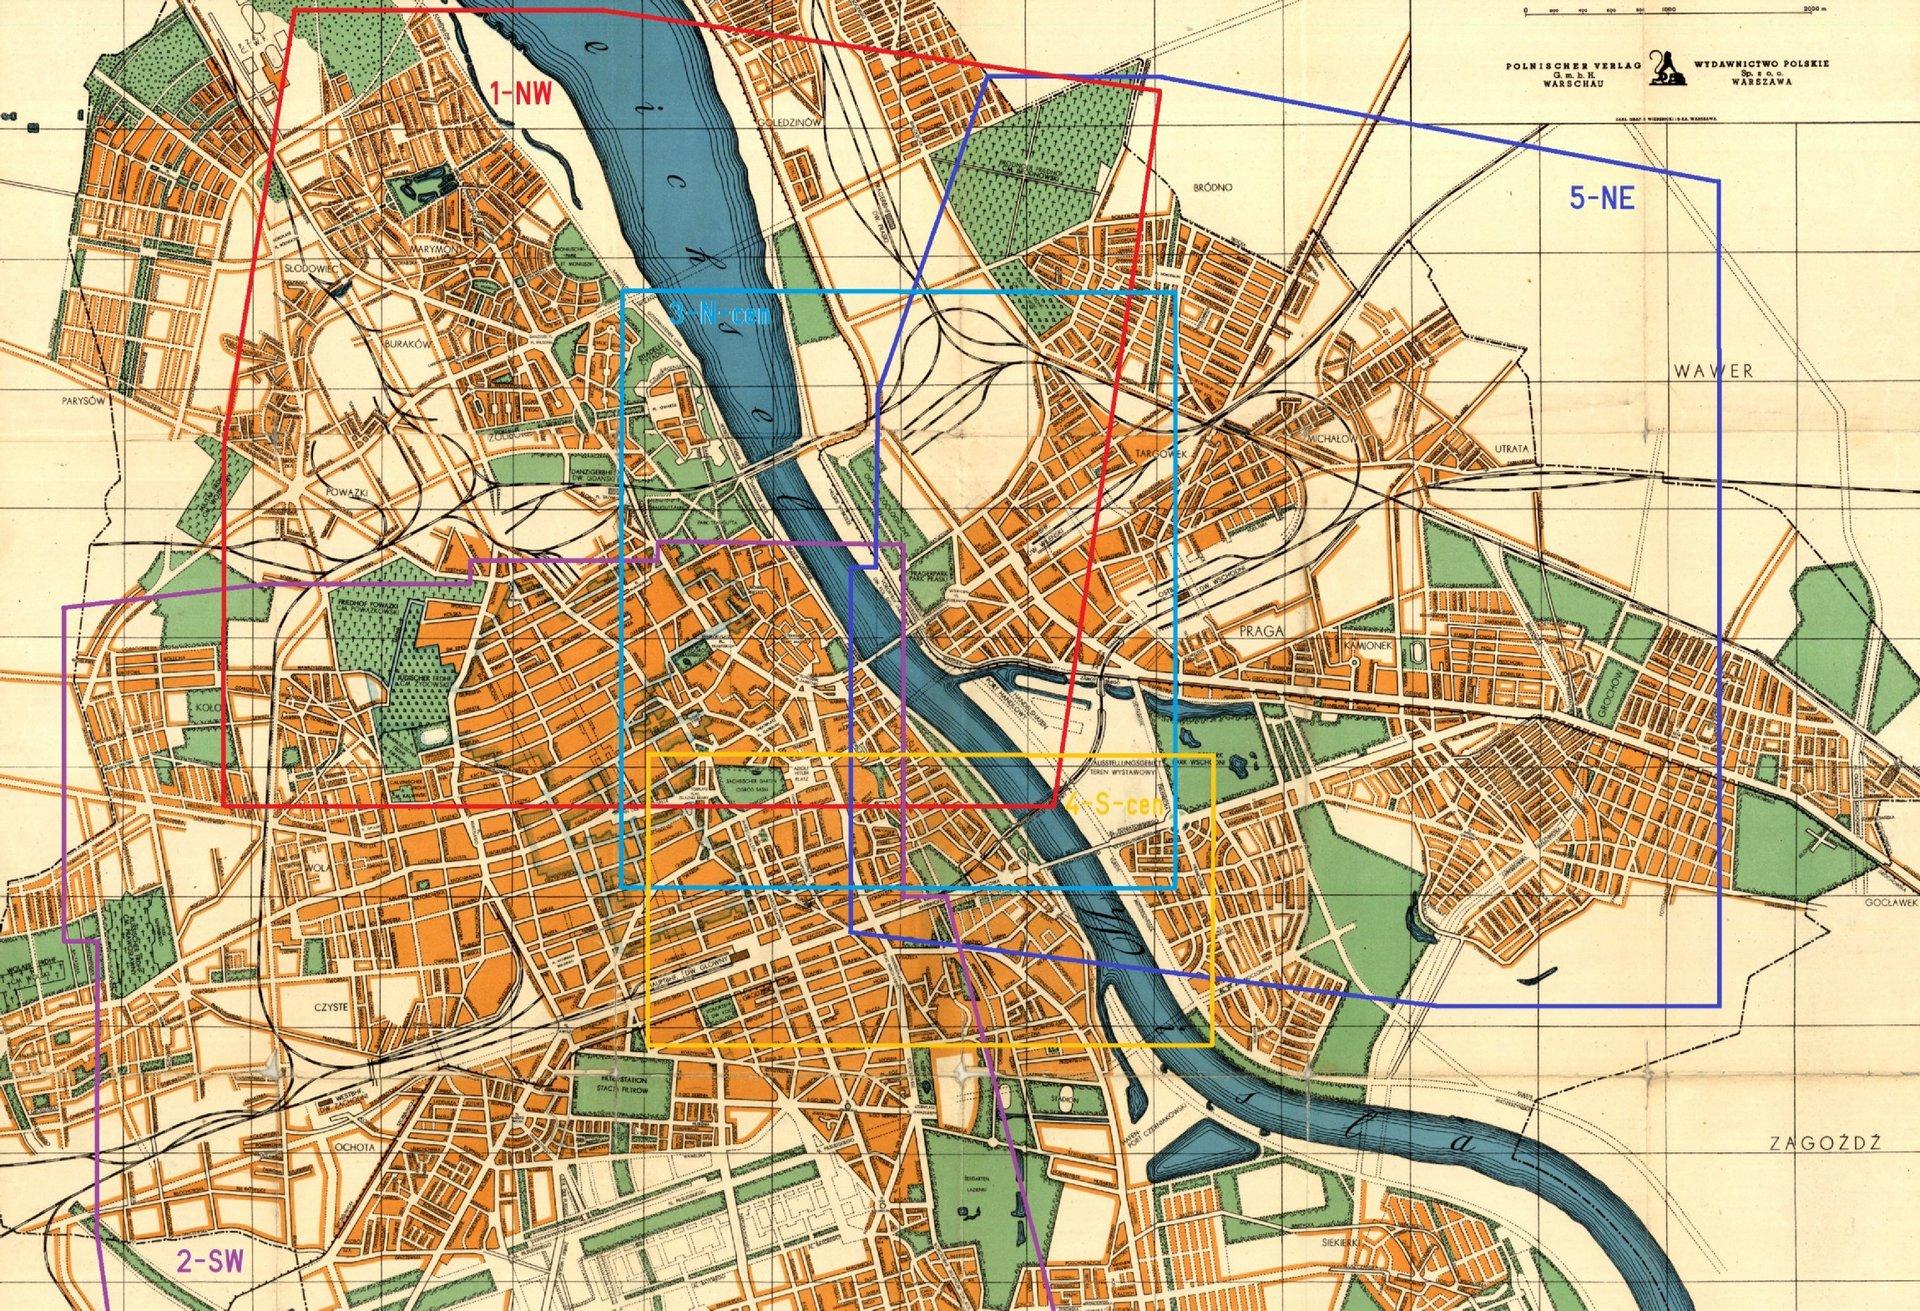 WARSZAWA - WARSCHAU - plan miasta 1941 modified.jpg